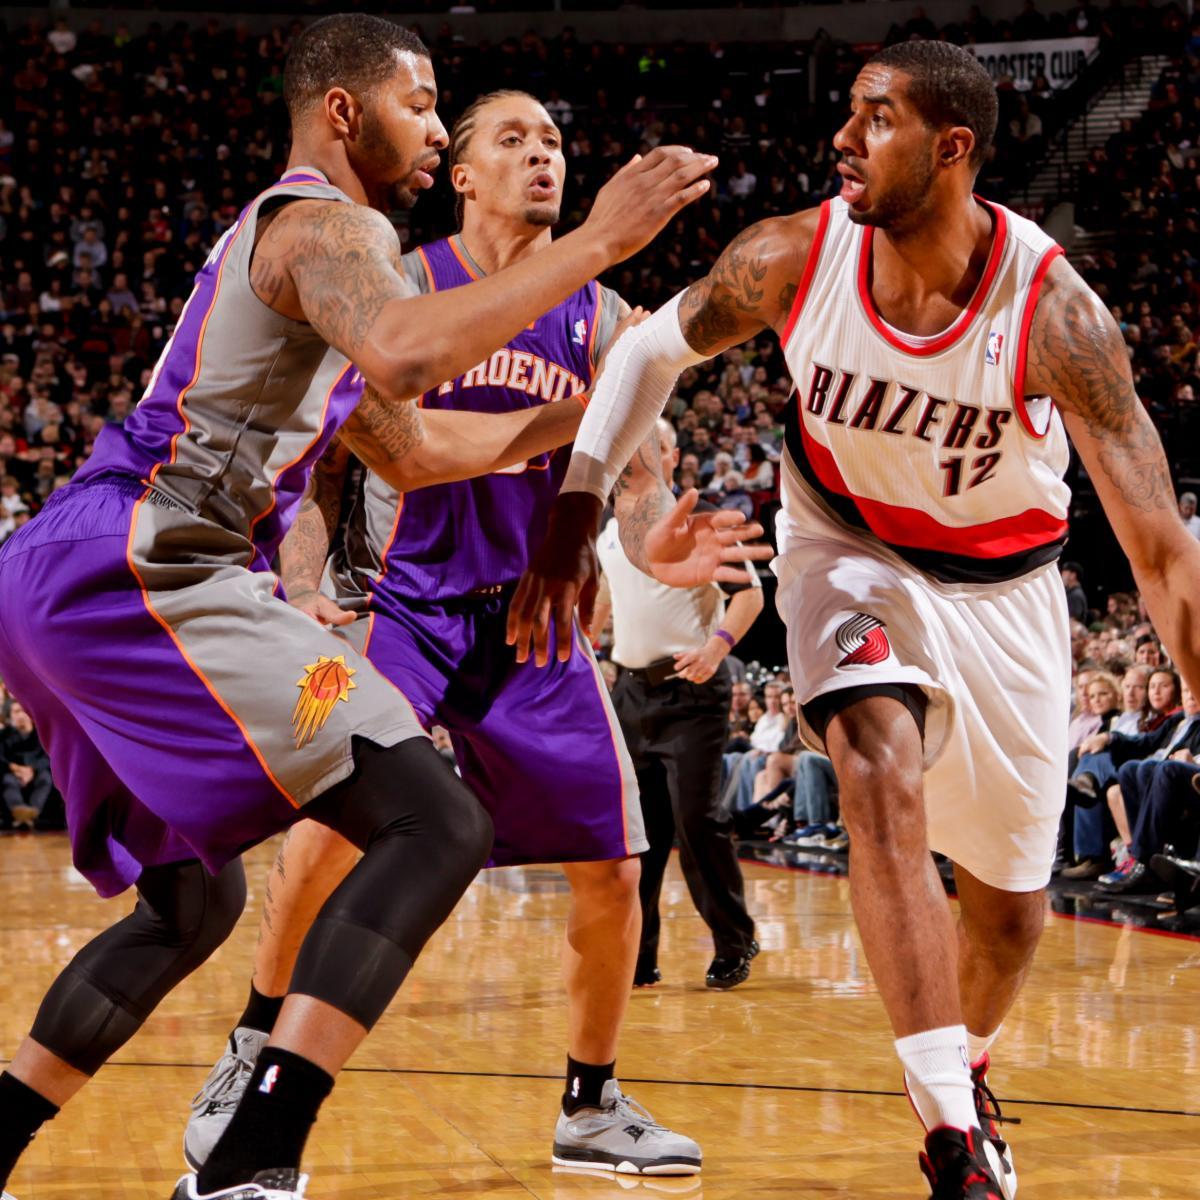 Portland Trail Blazers Vs. Phoenix Suns: Preview And